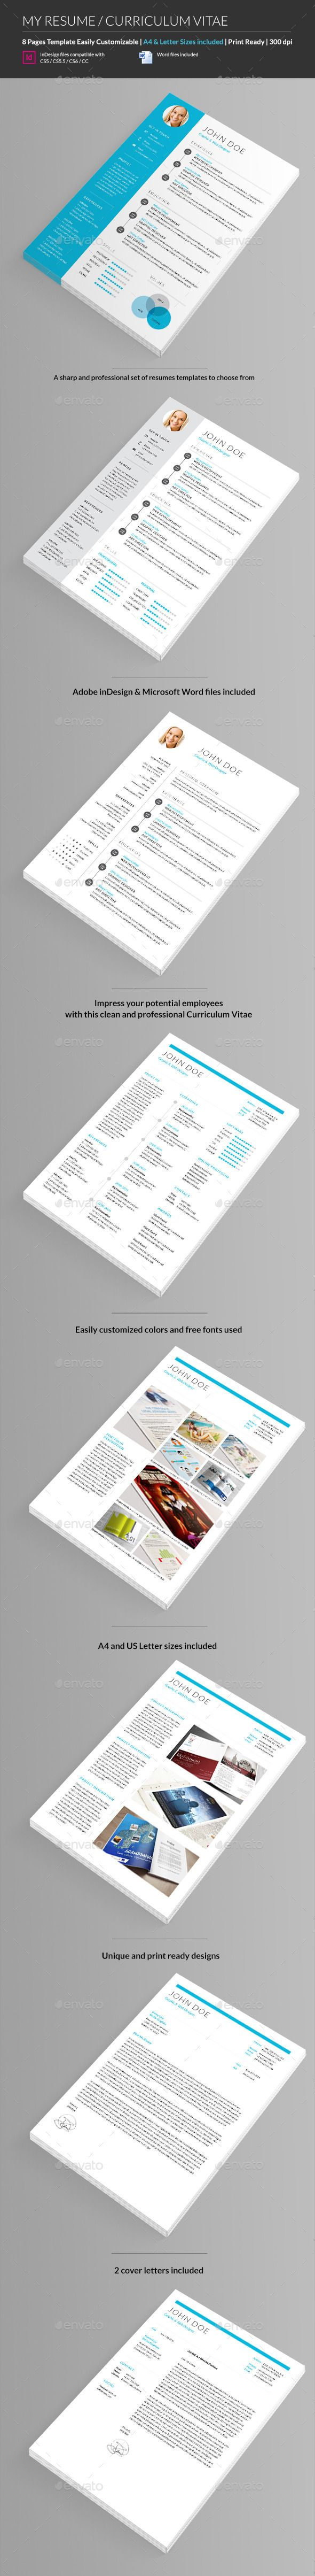 Microsoft Word Templates Cv%0A My Resume  CV